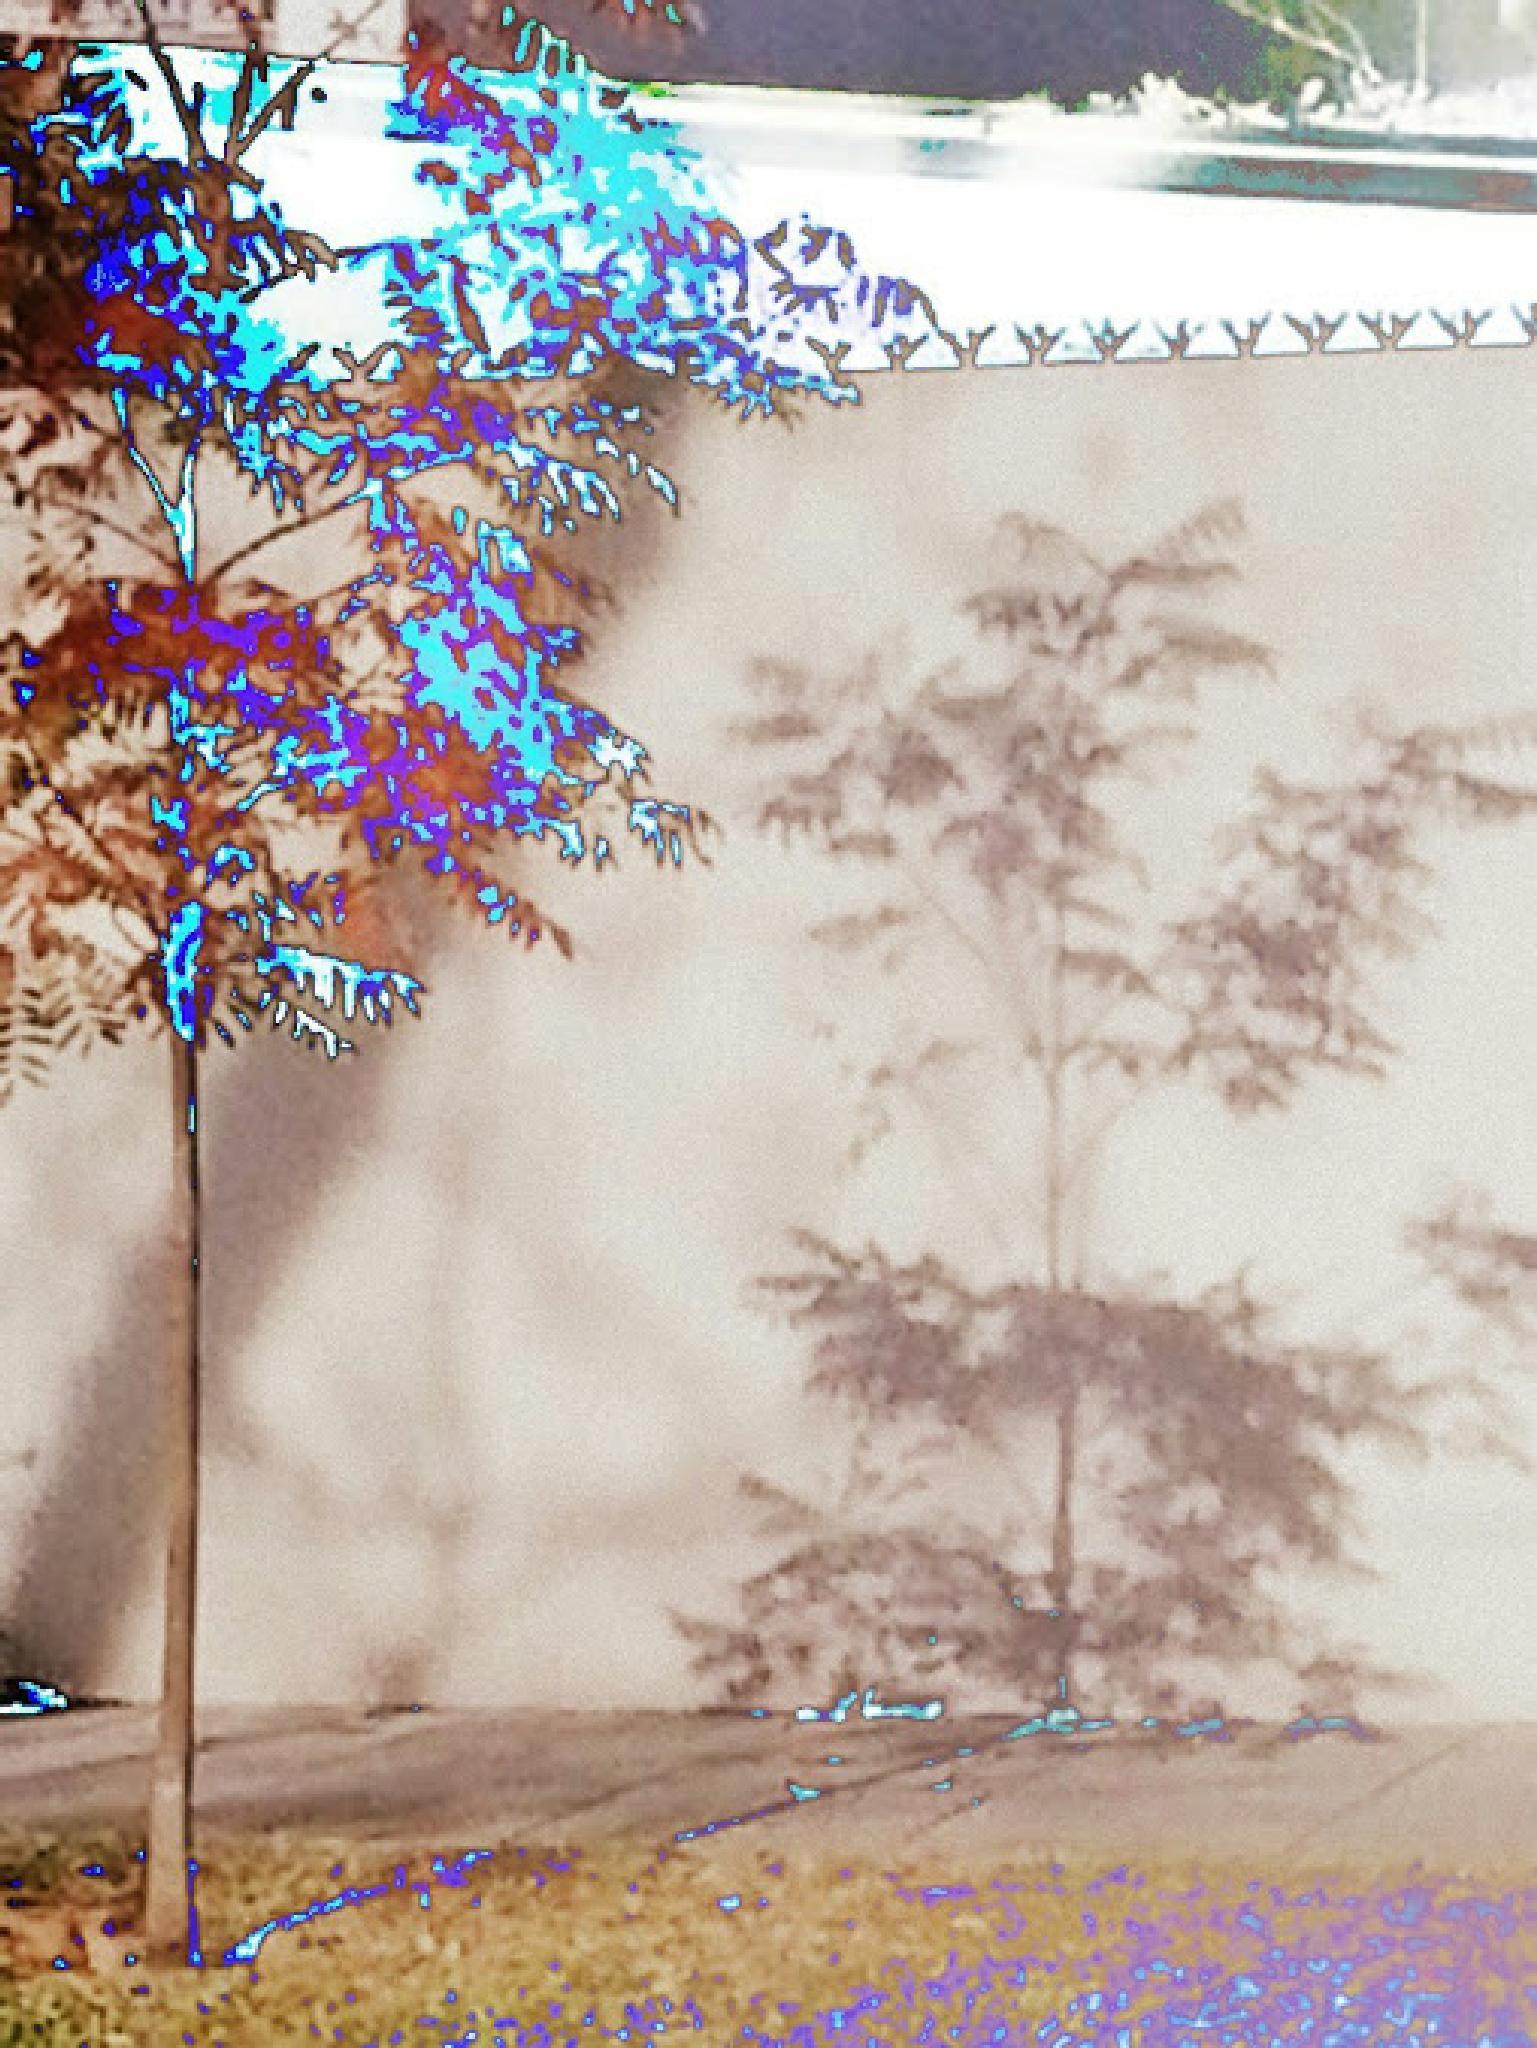 URBAN TREE by cantelegraciela